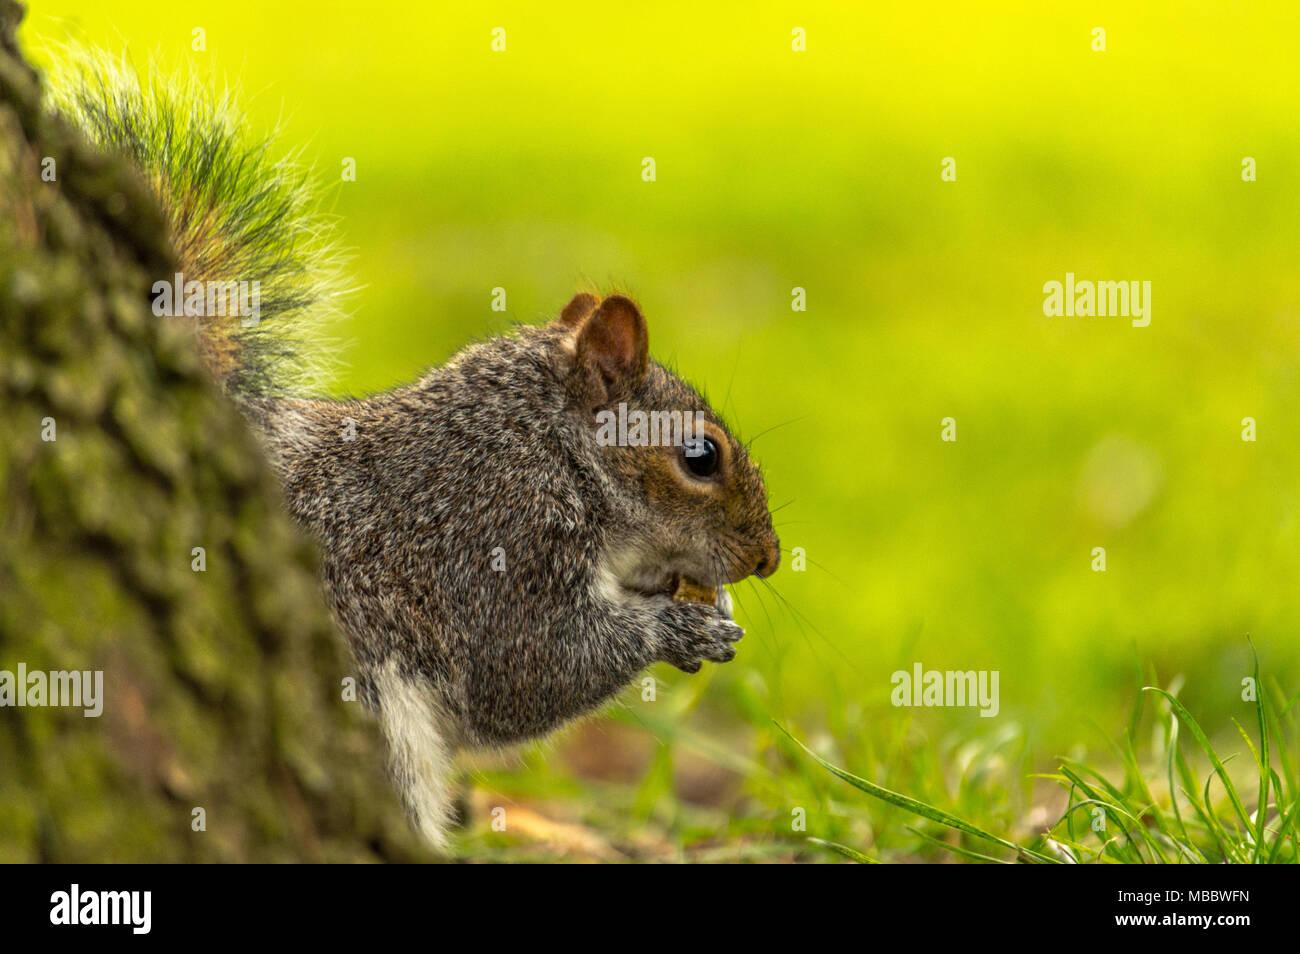 Abington park, Wildlife Stock Photo